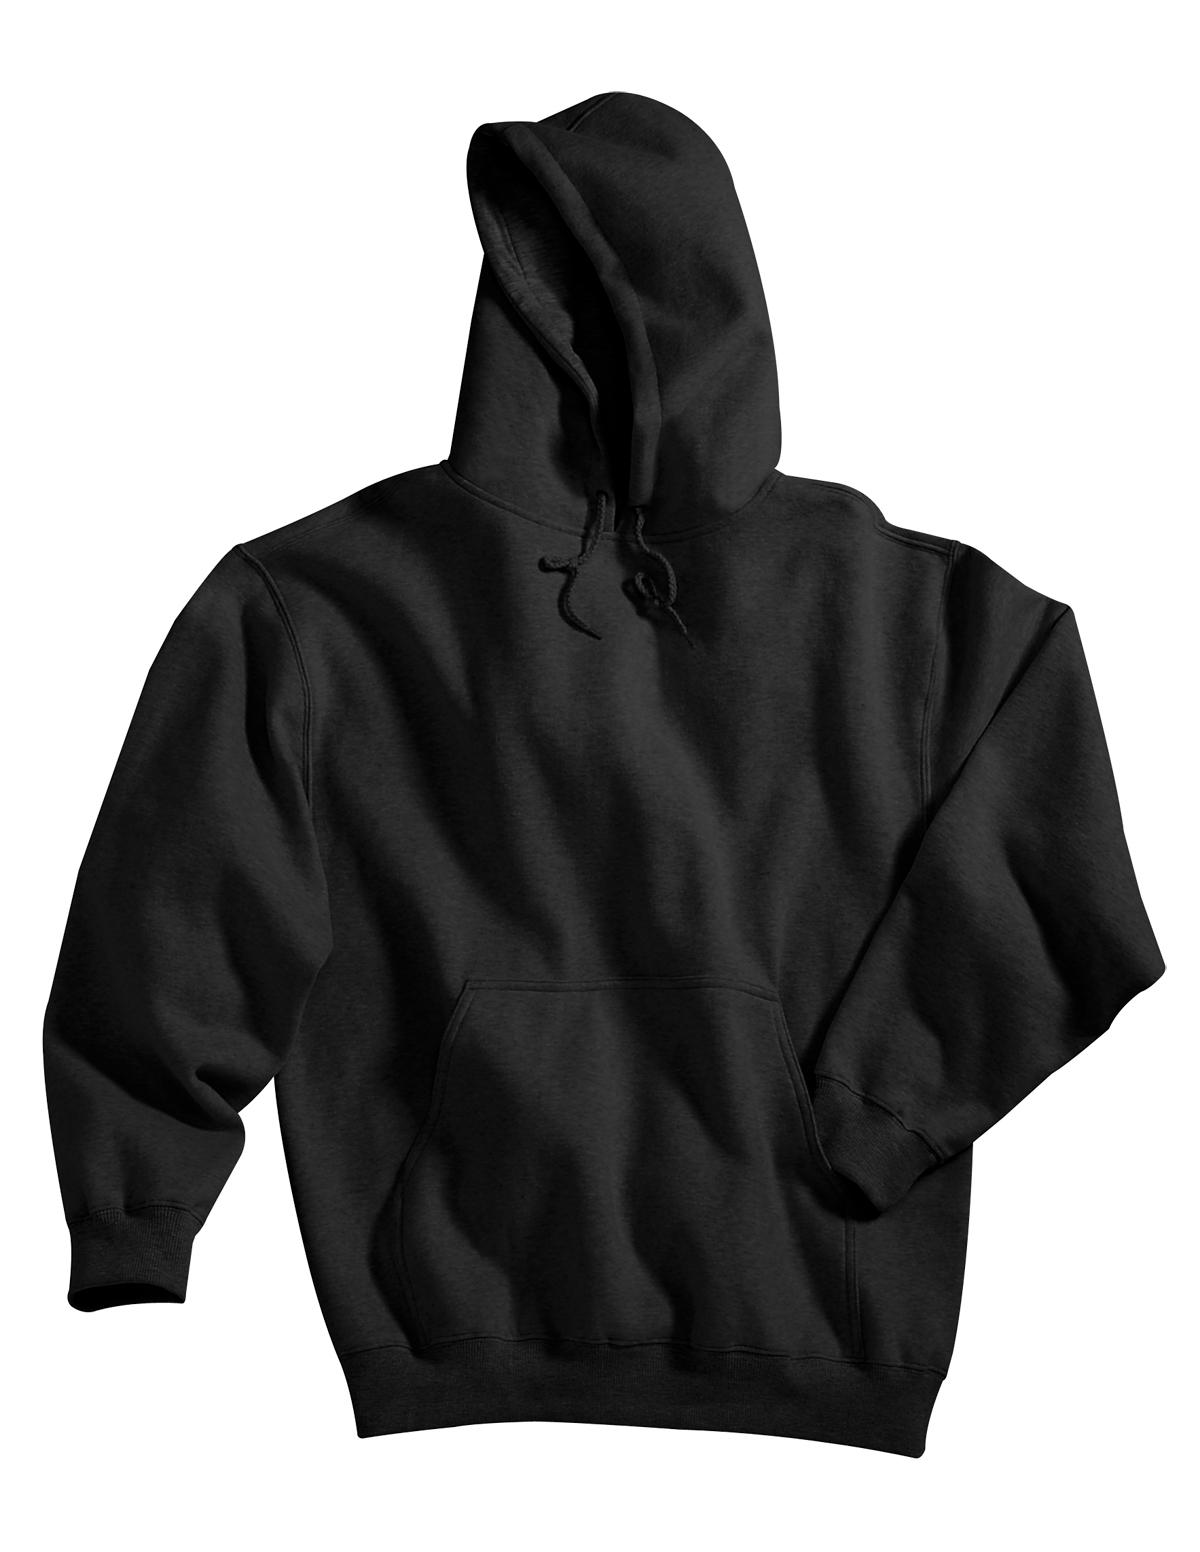 Premium Sweatshirts